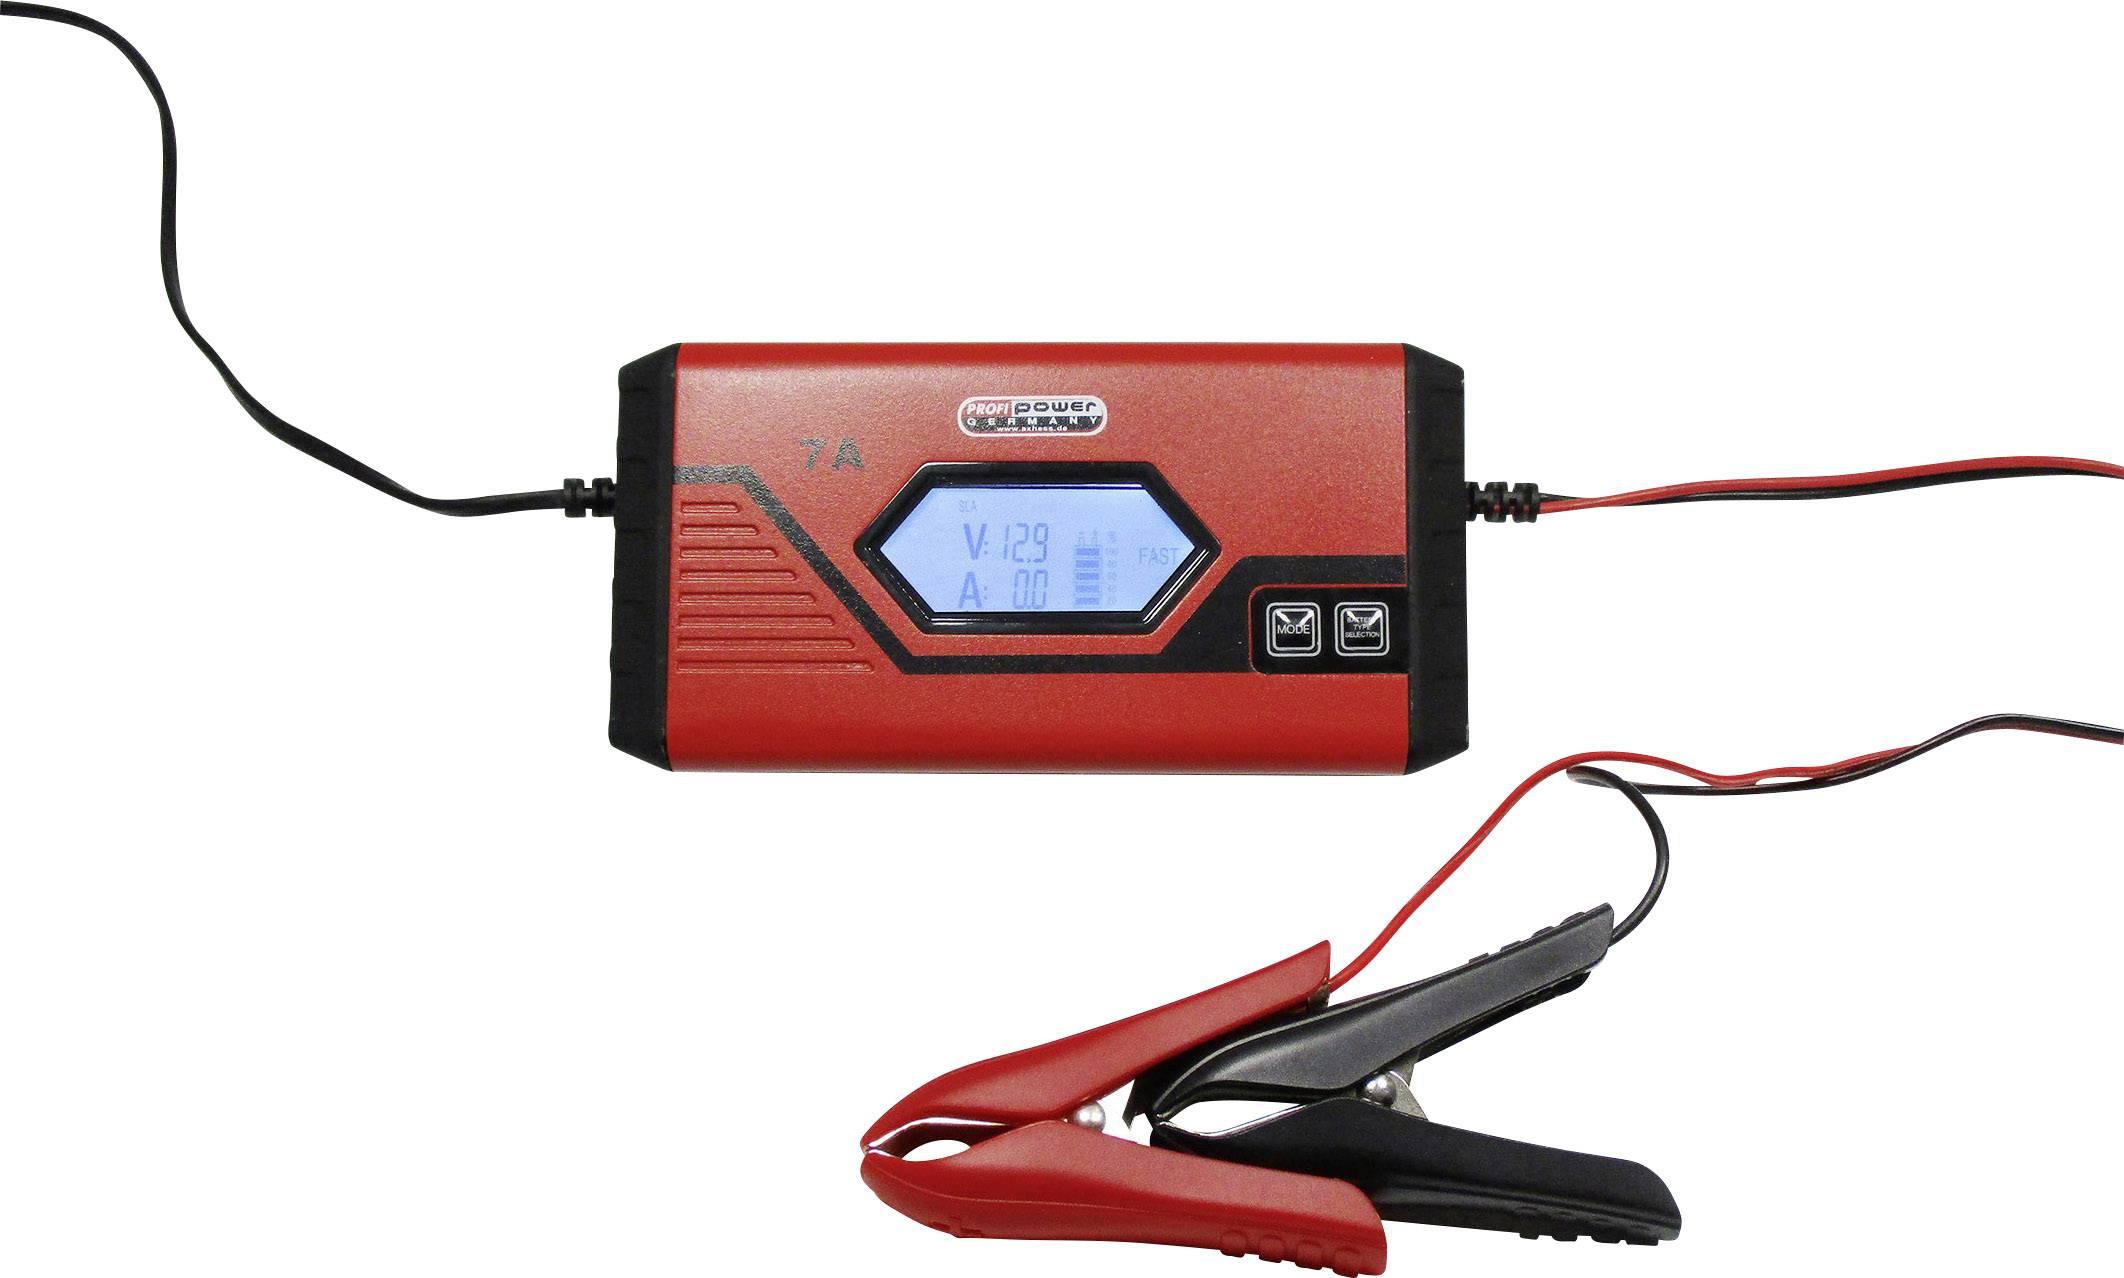 Nabíječka autobaterie Profi Power 2913908, 12 V, 3.5 A, 7 A